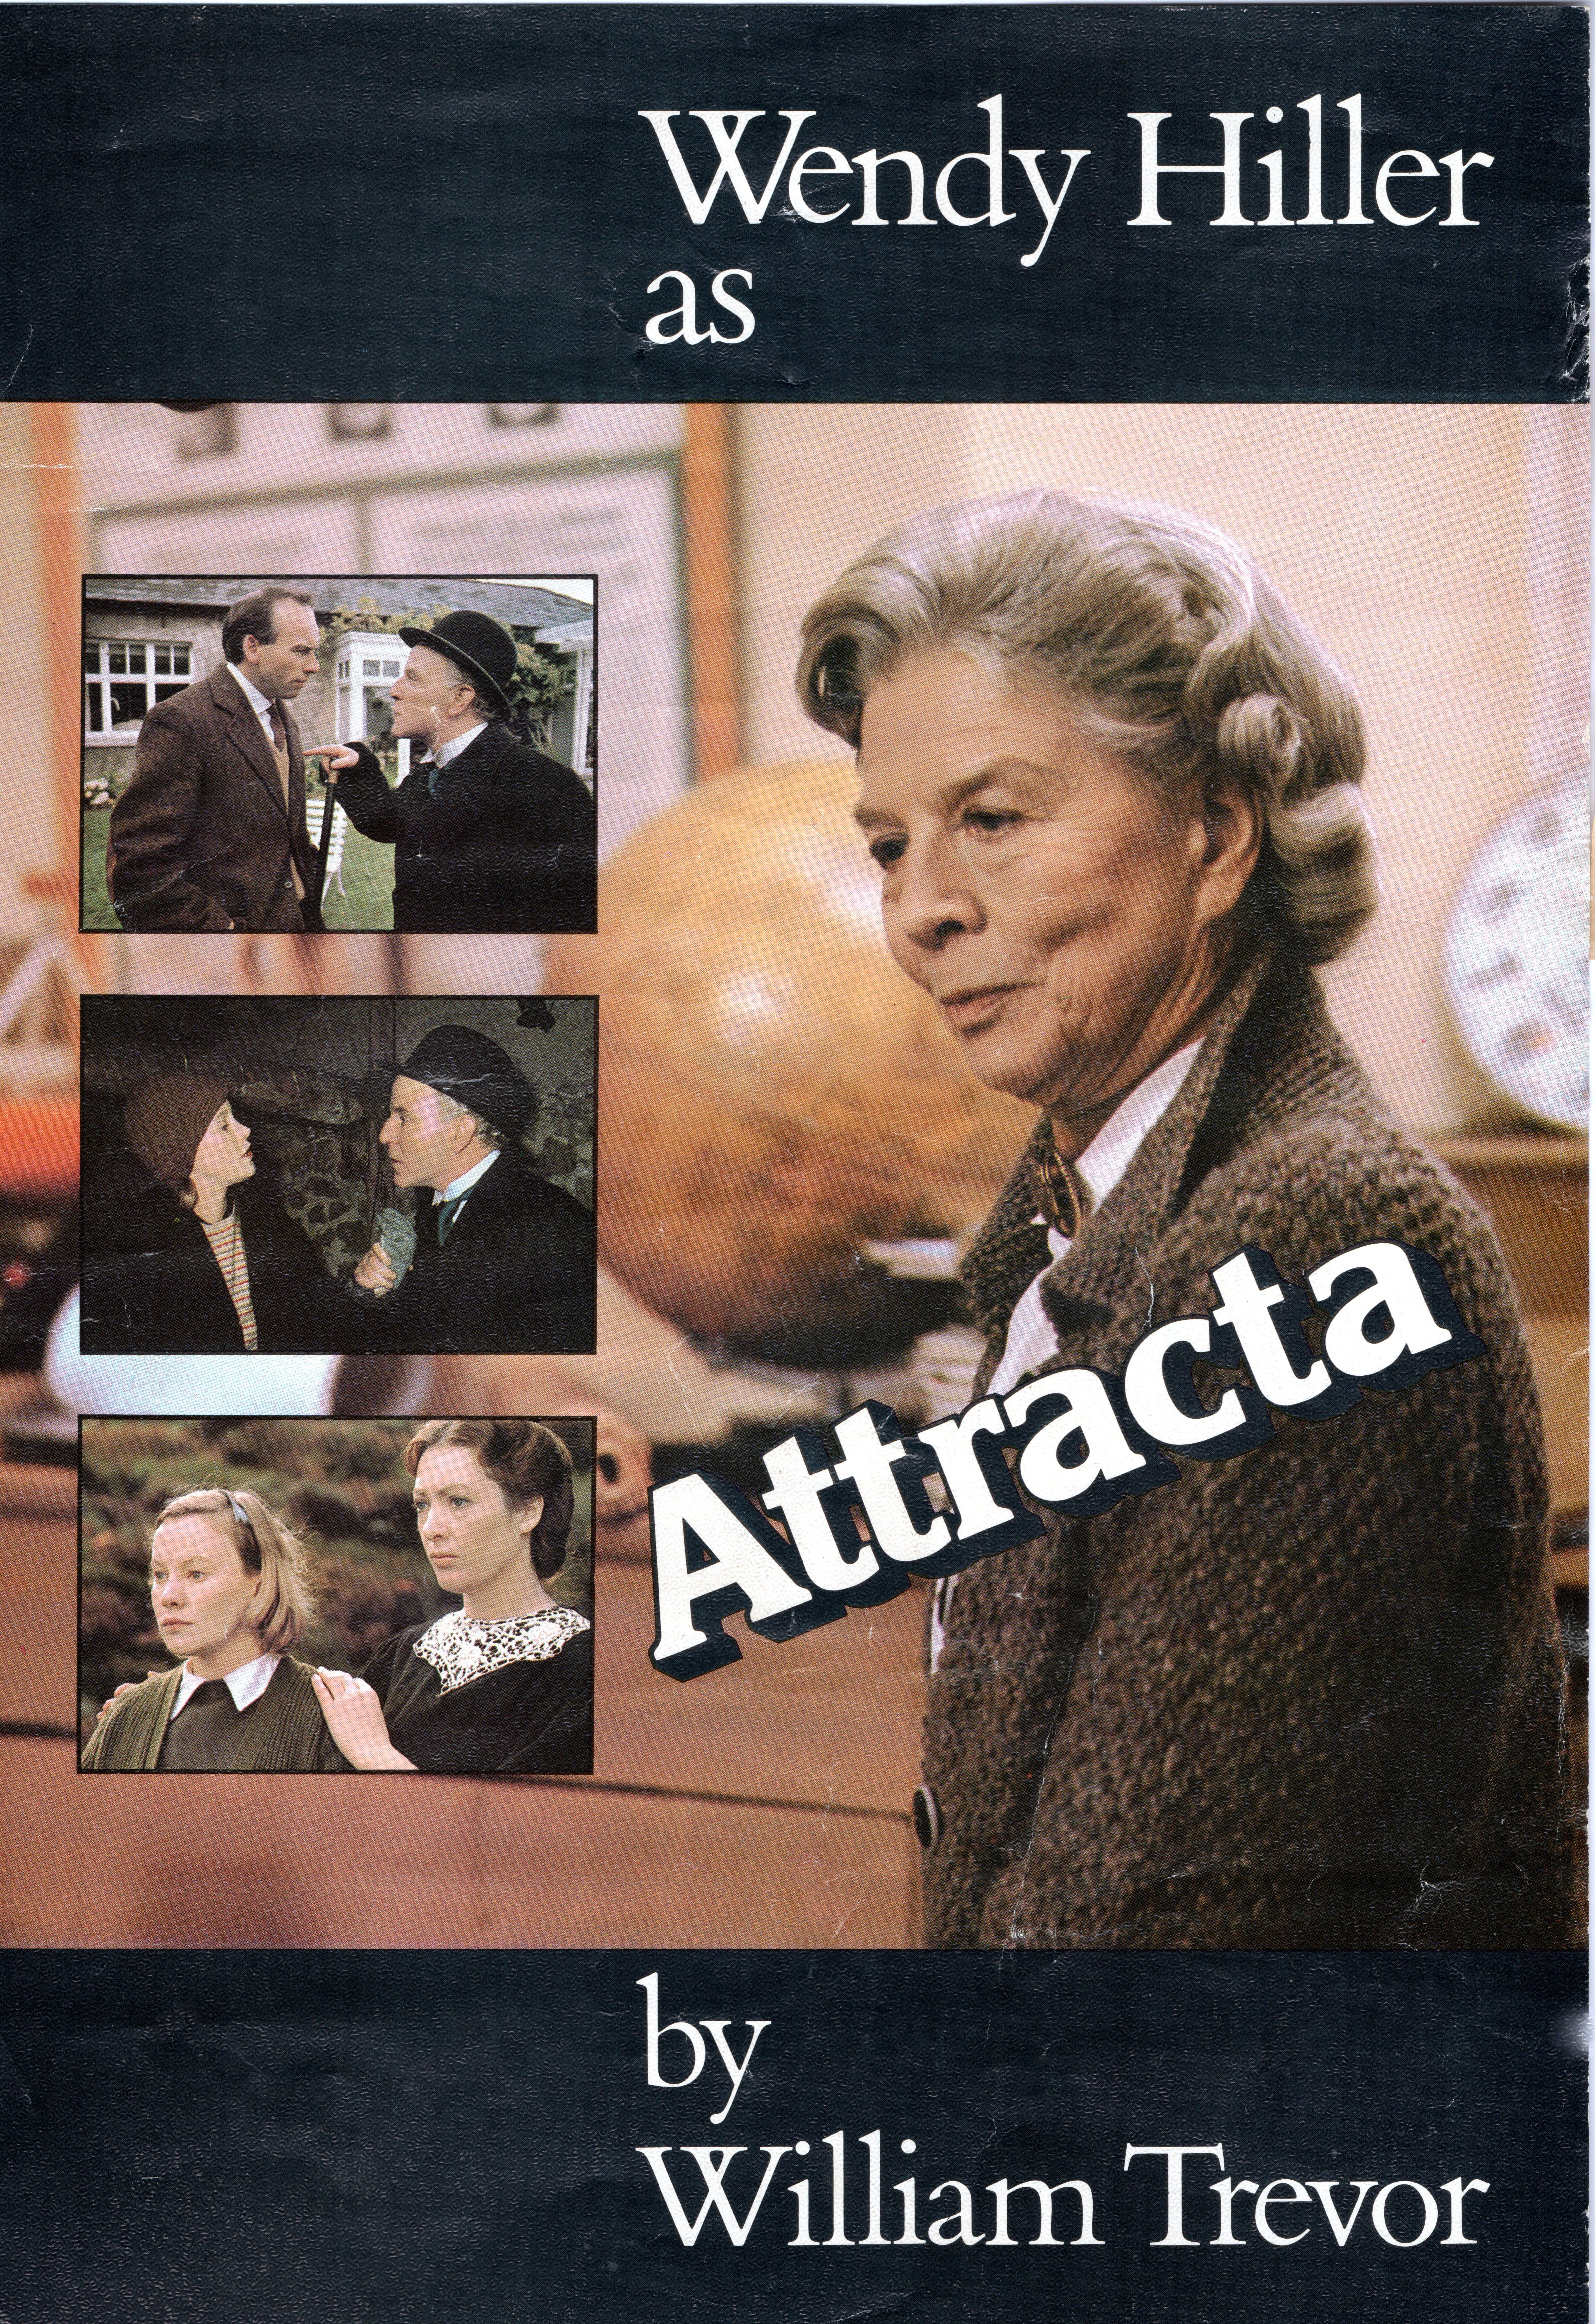 Attracta ((1983))